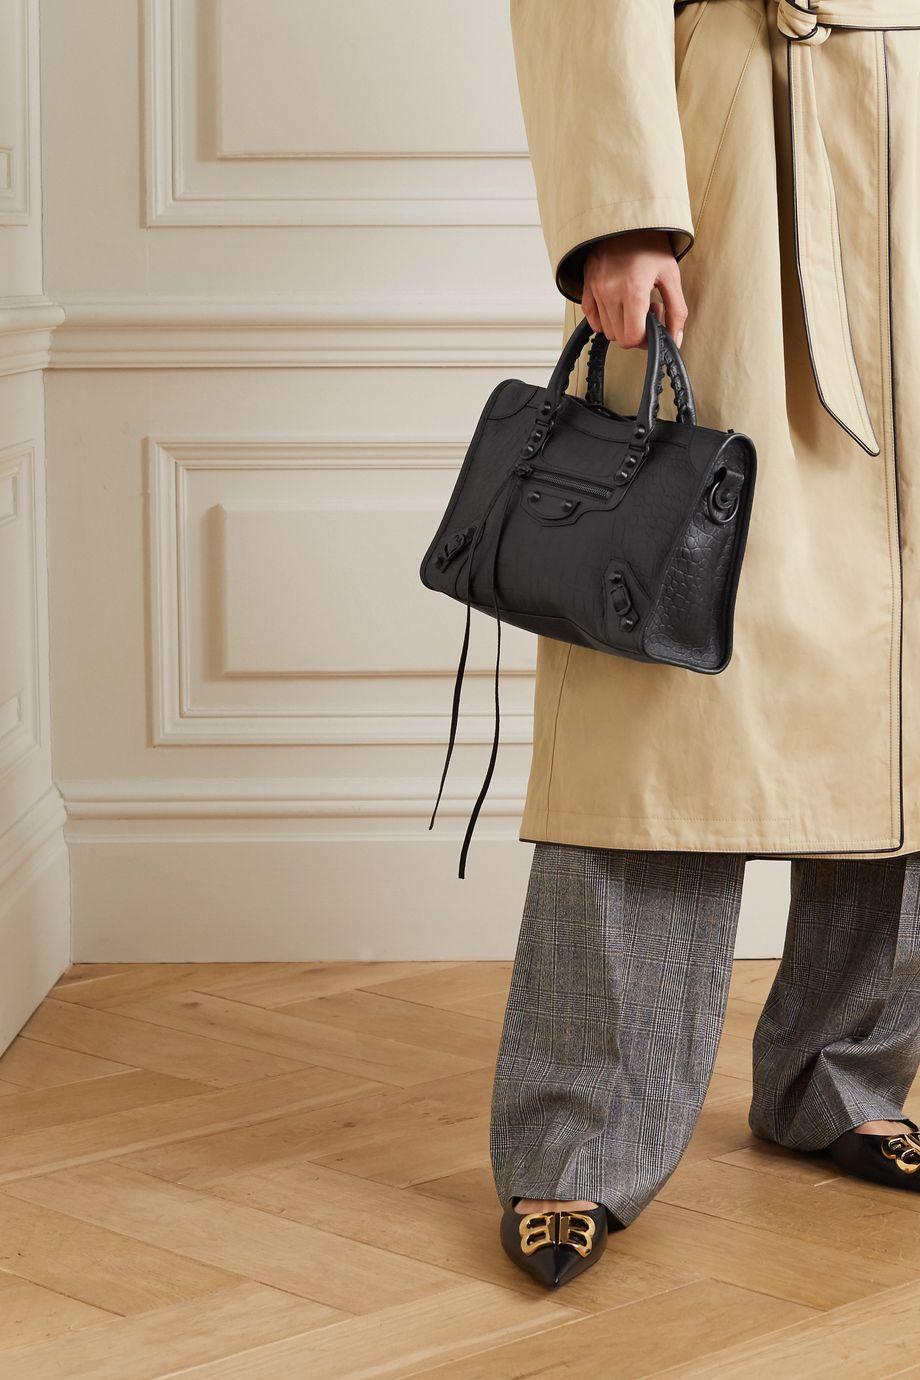 Balenciaga Classic City croc-effect leather tote bag